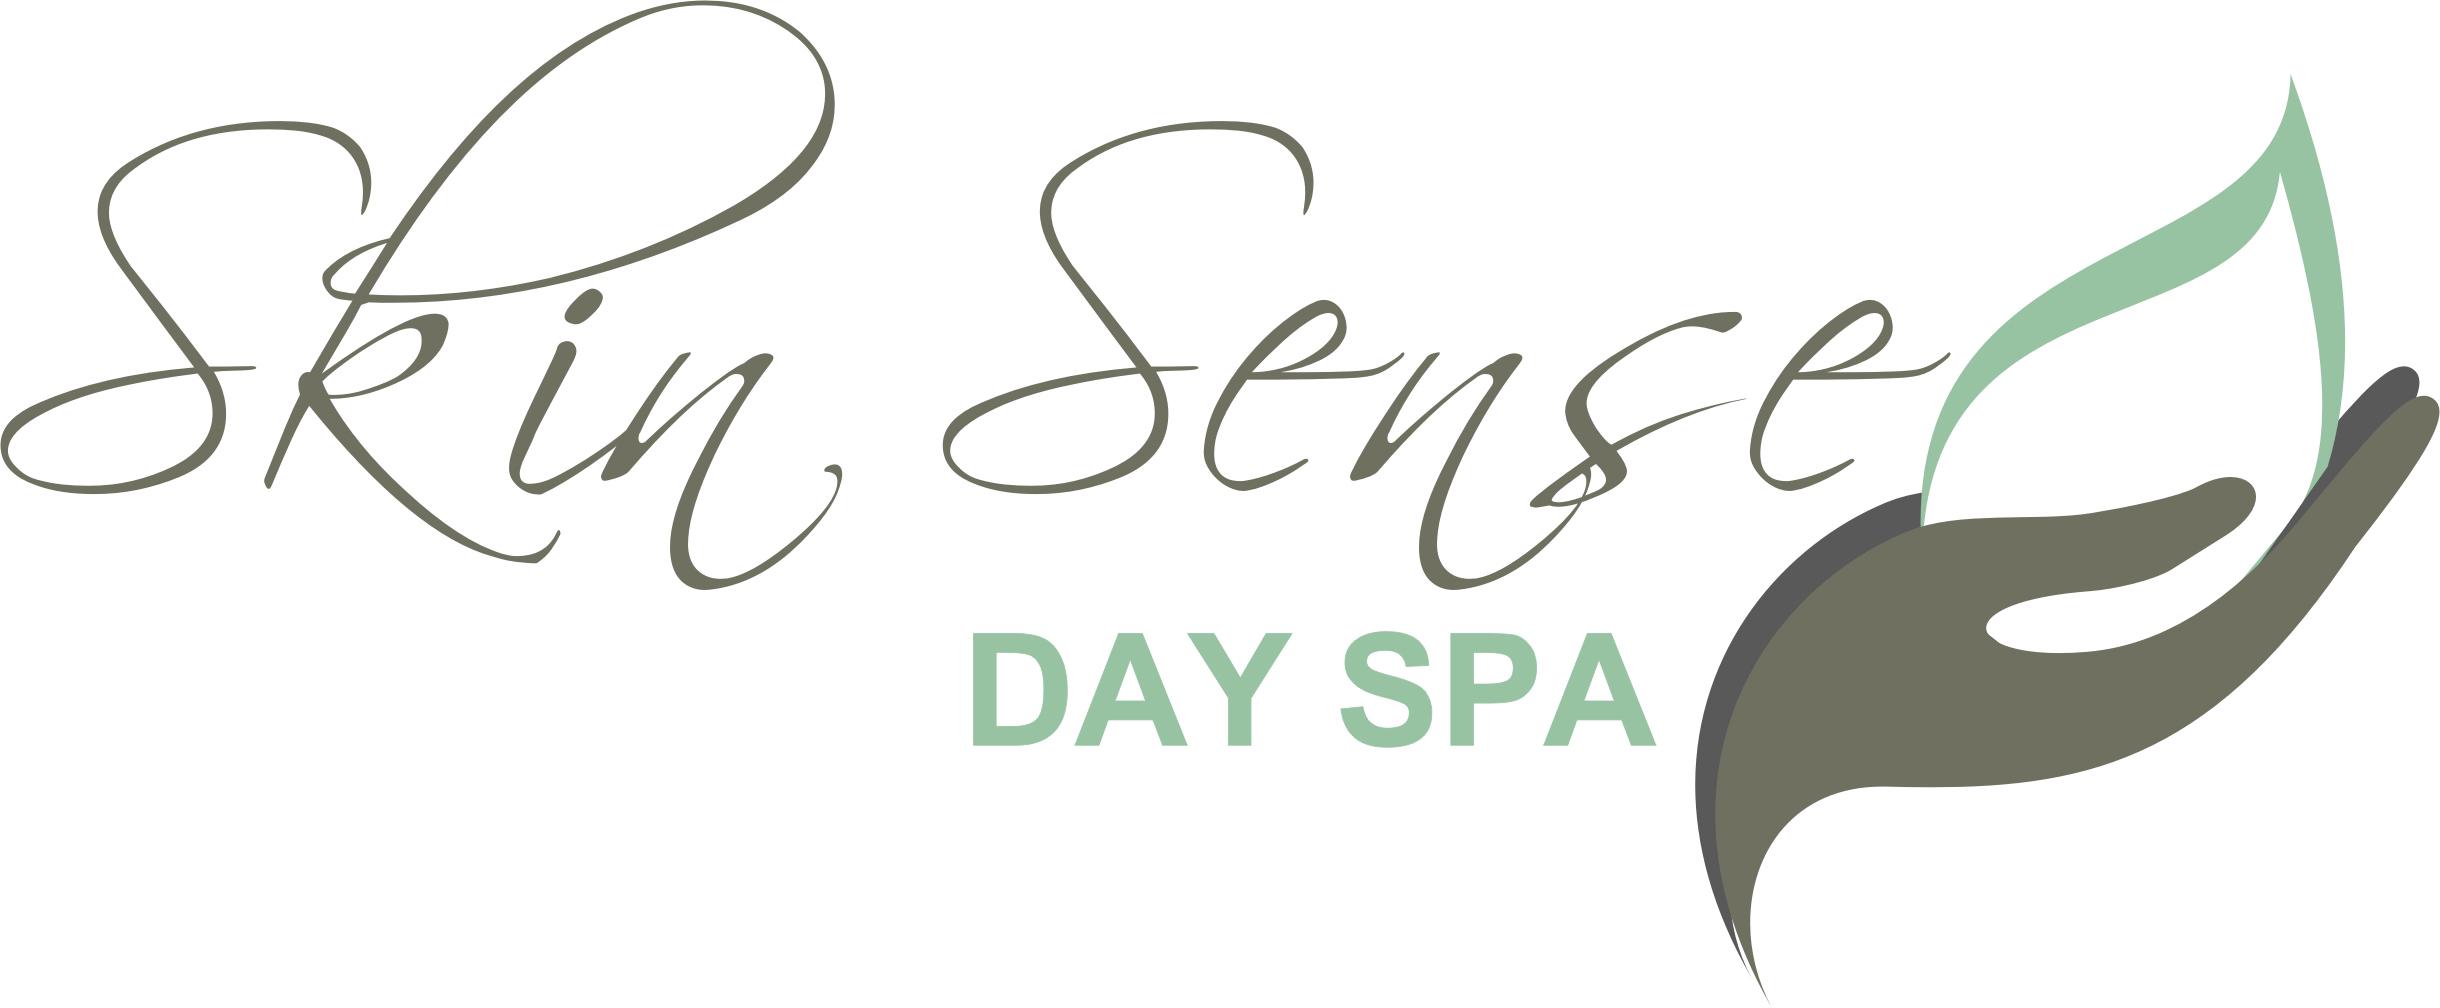 Skin Sense Day Spa